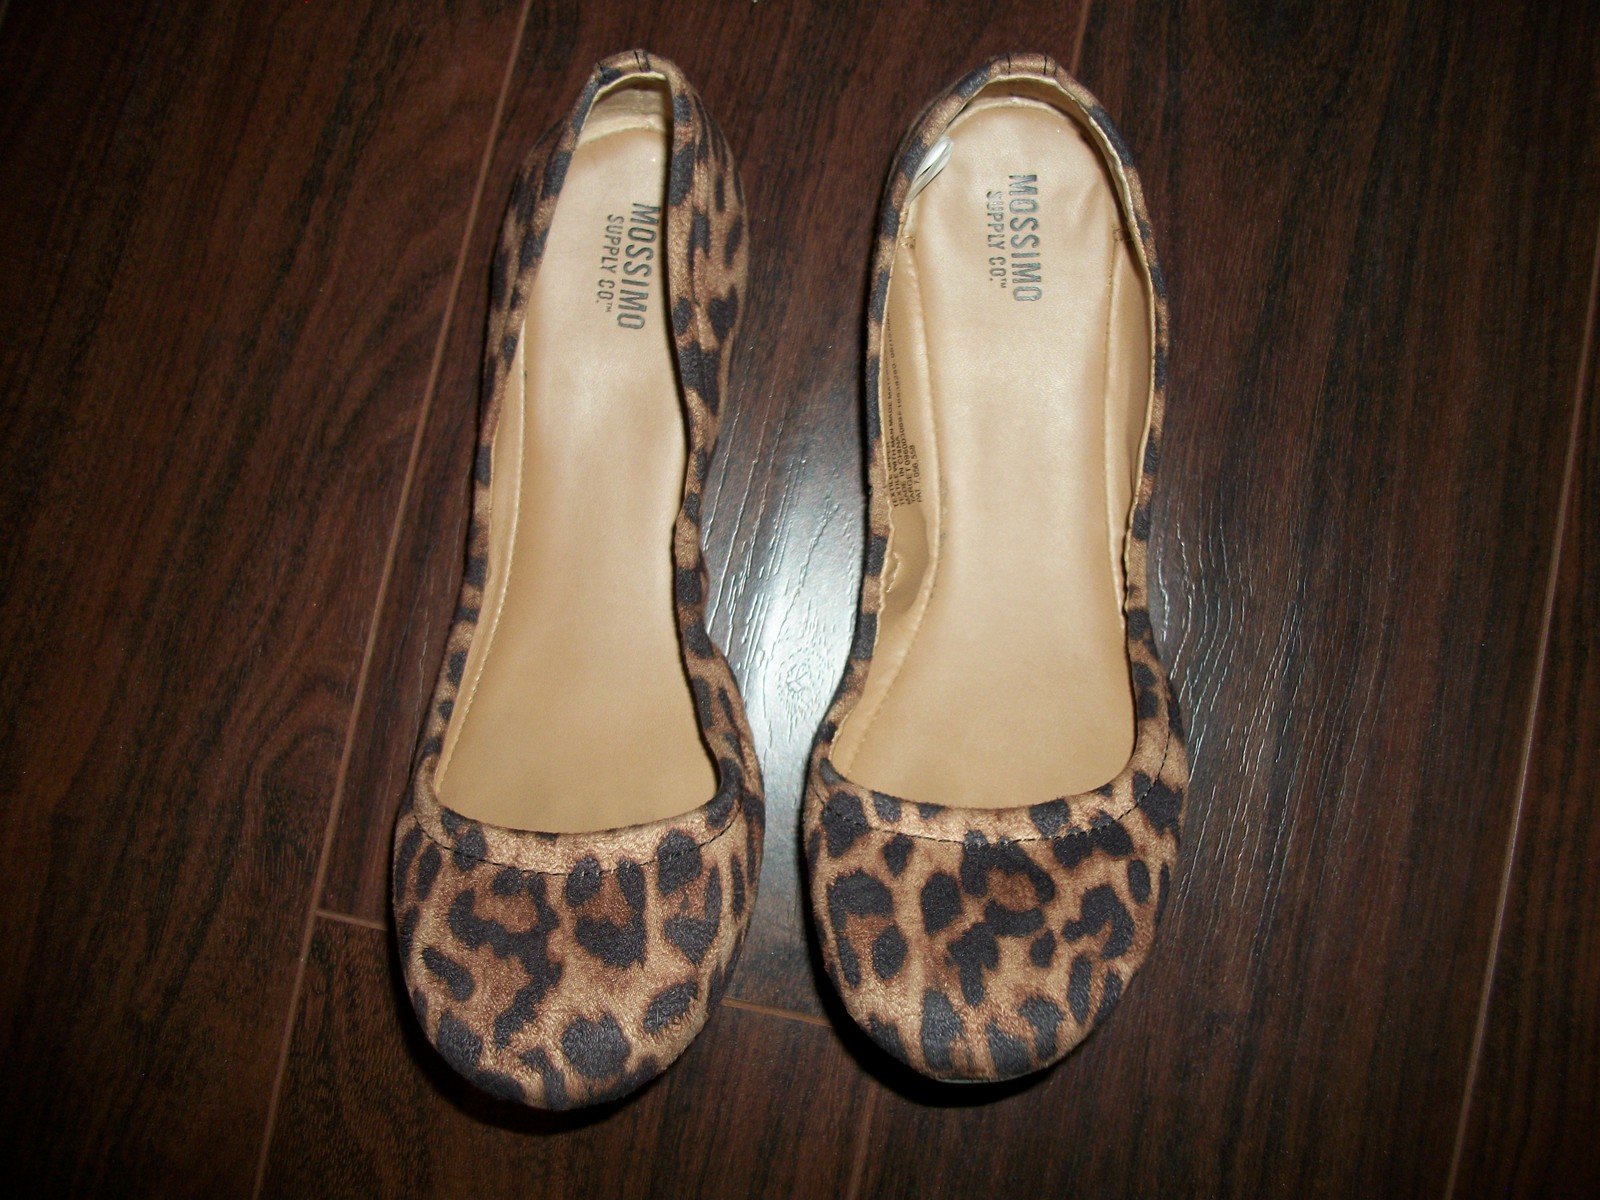 593d5d8e6bd8 Womens Mossimo Leopard Print Ballet Scrunch and 13 similar items